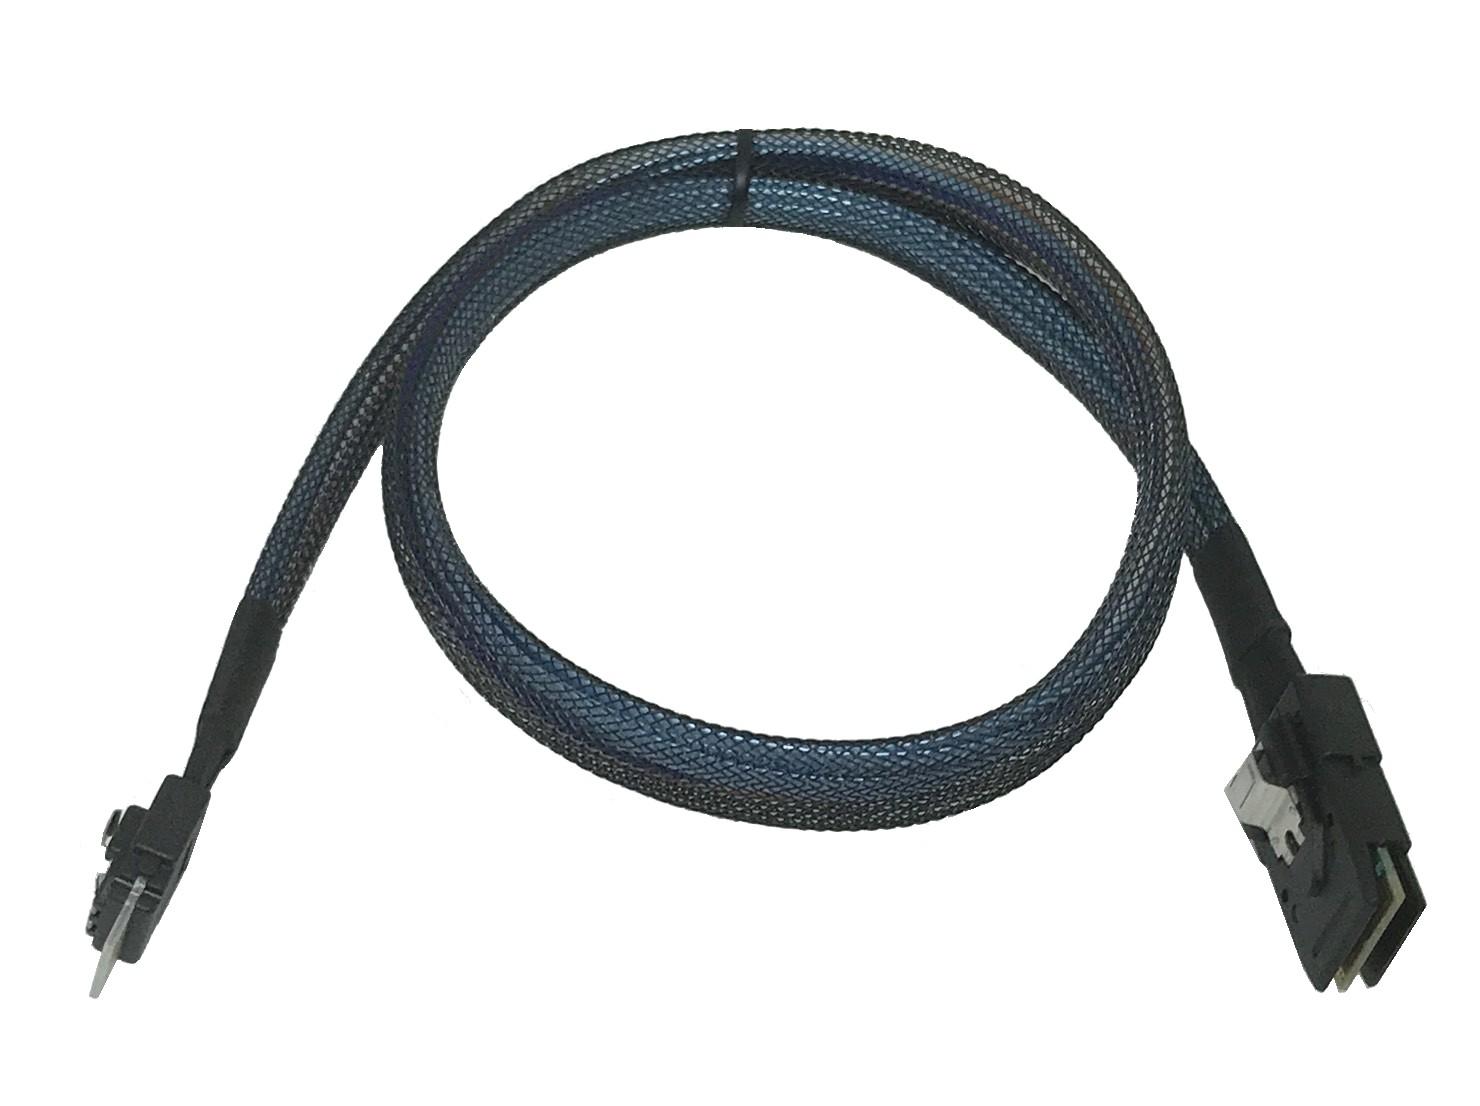 Taiwan Slimline Sas Sff 8654 To Mini Sas Sff 8087 Cable